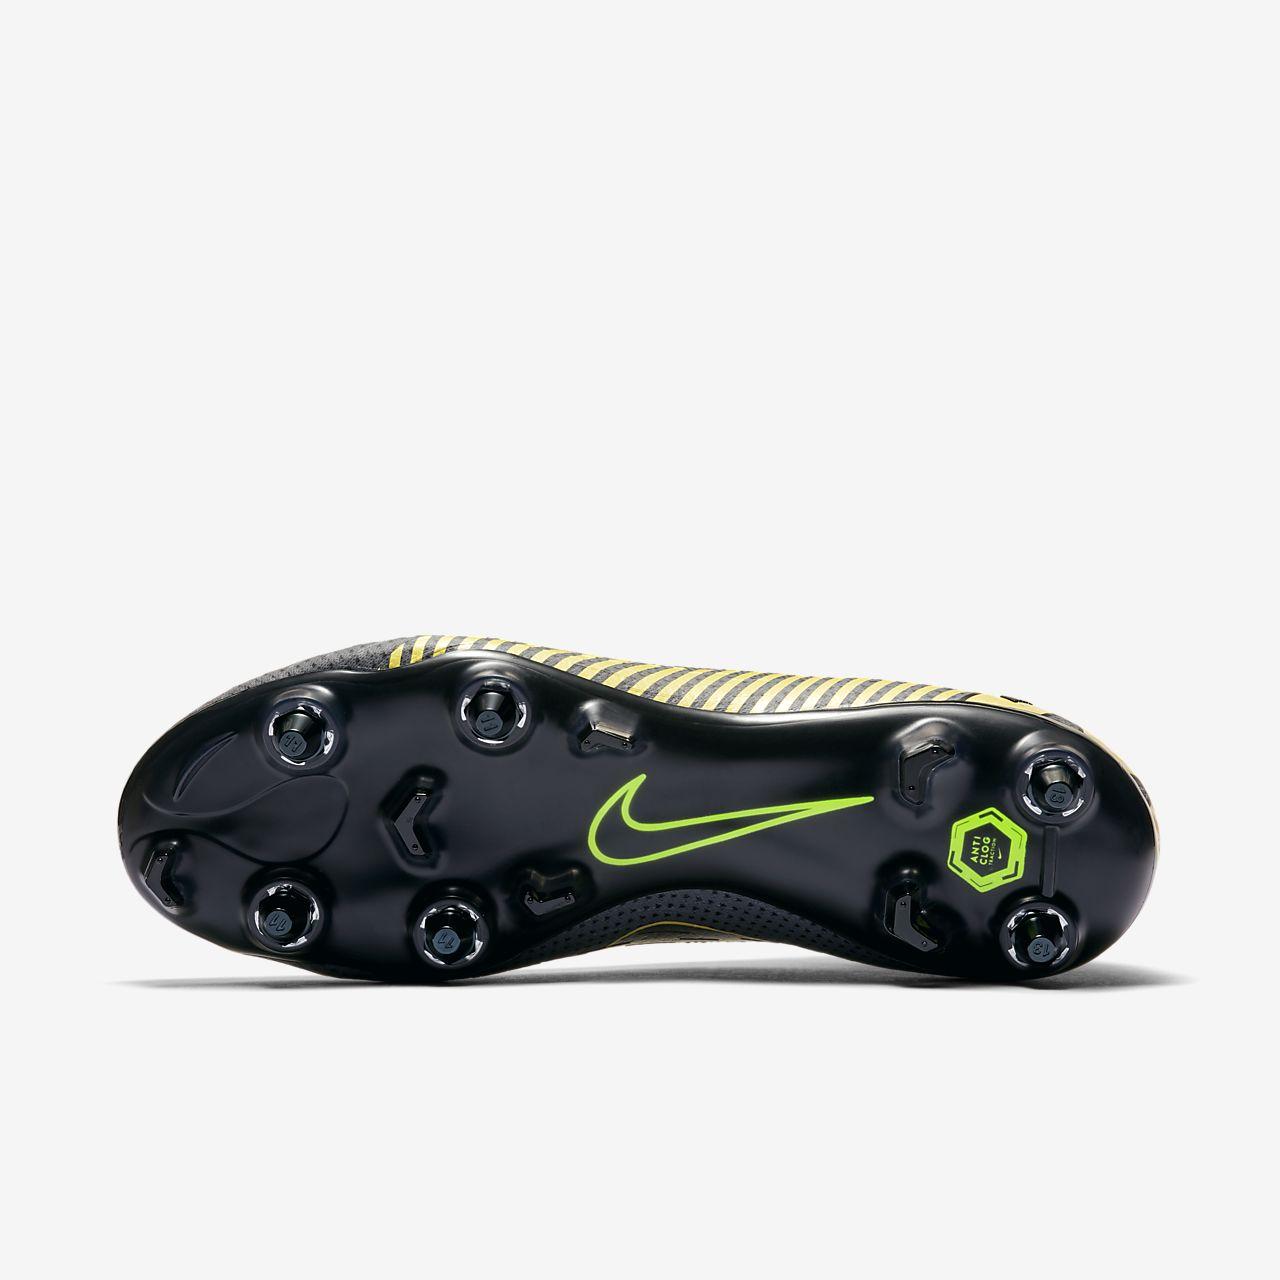 premium selection 08e53 03de0 ... Fotbollssko för mjukt underlag Nike Mercurial Superfly 360 Elite SG-PRO  Anti-Clog